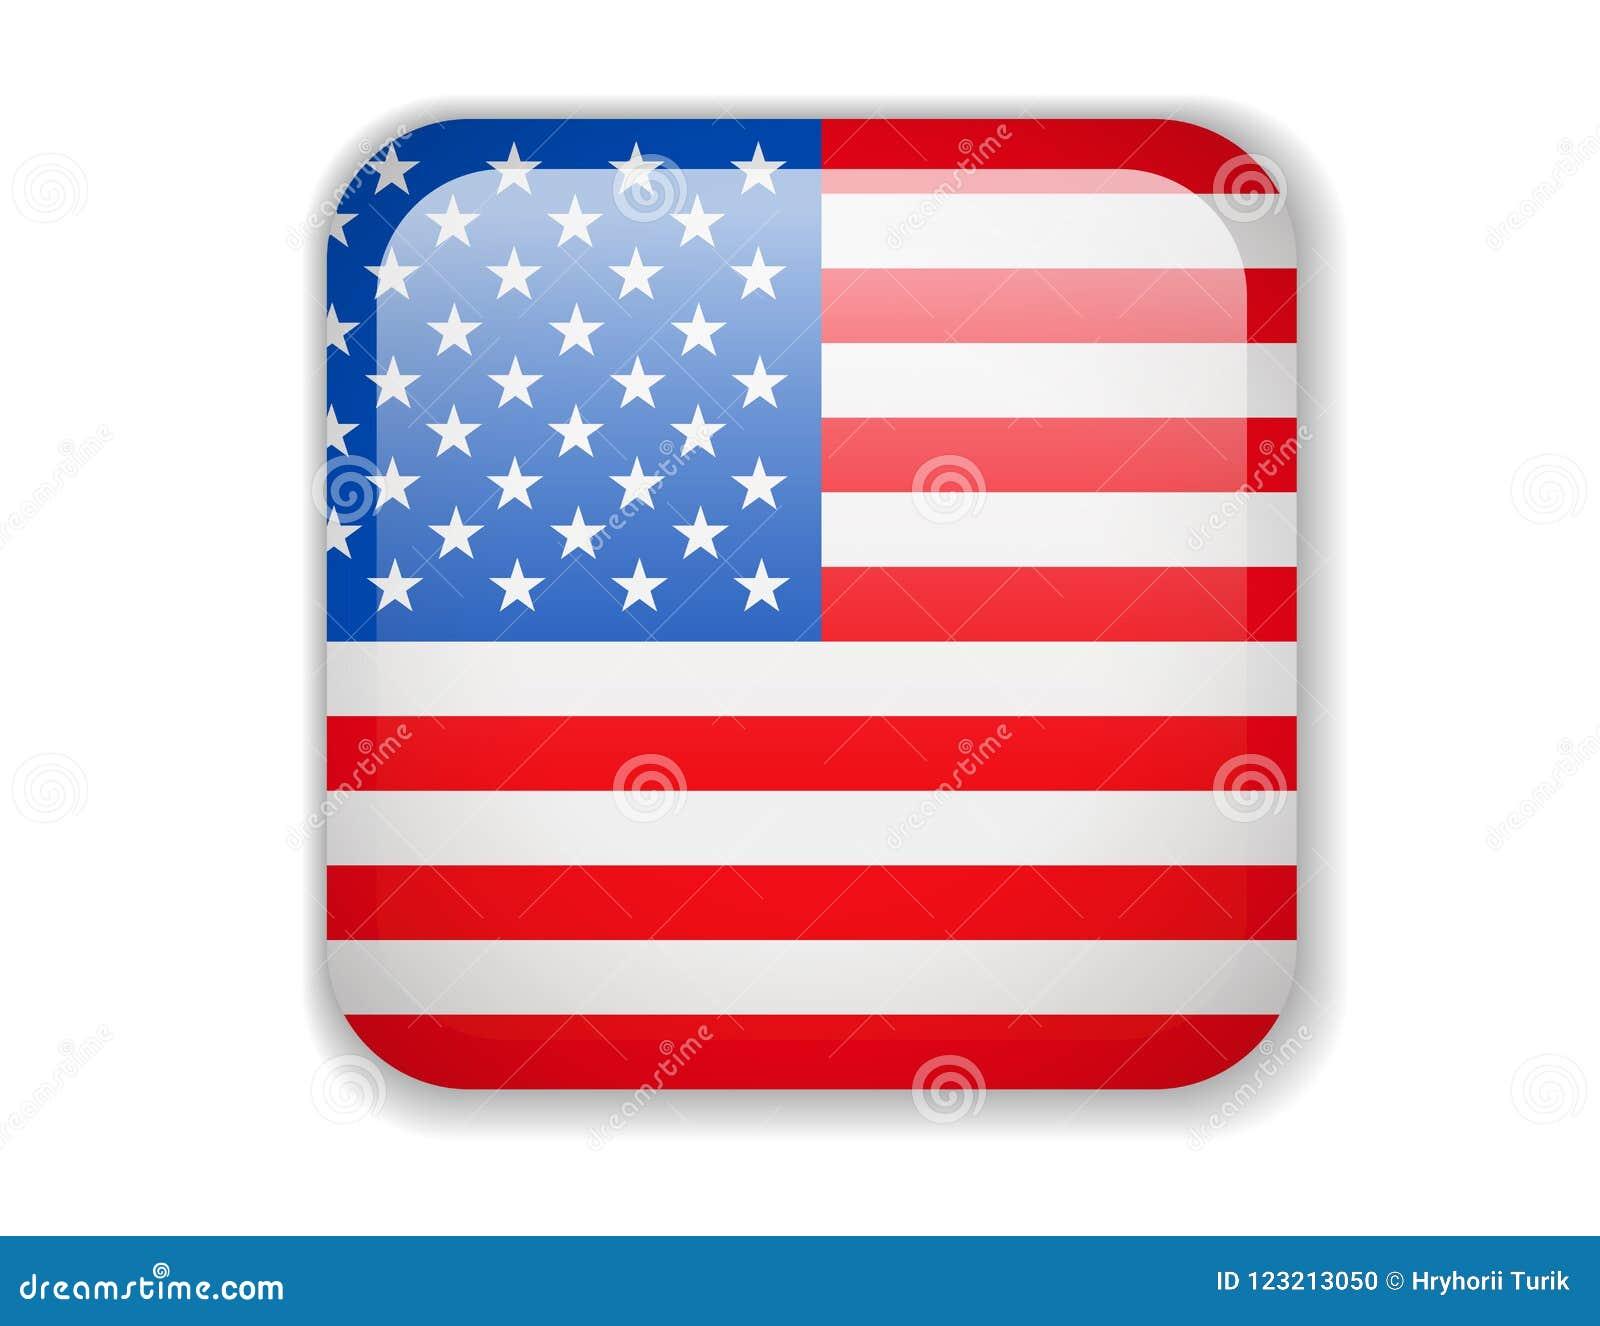 e57646139aa1 United States Flag. Bright Square Icon. Vector Illustration. More similar  stock illustrations